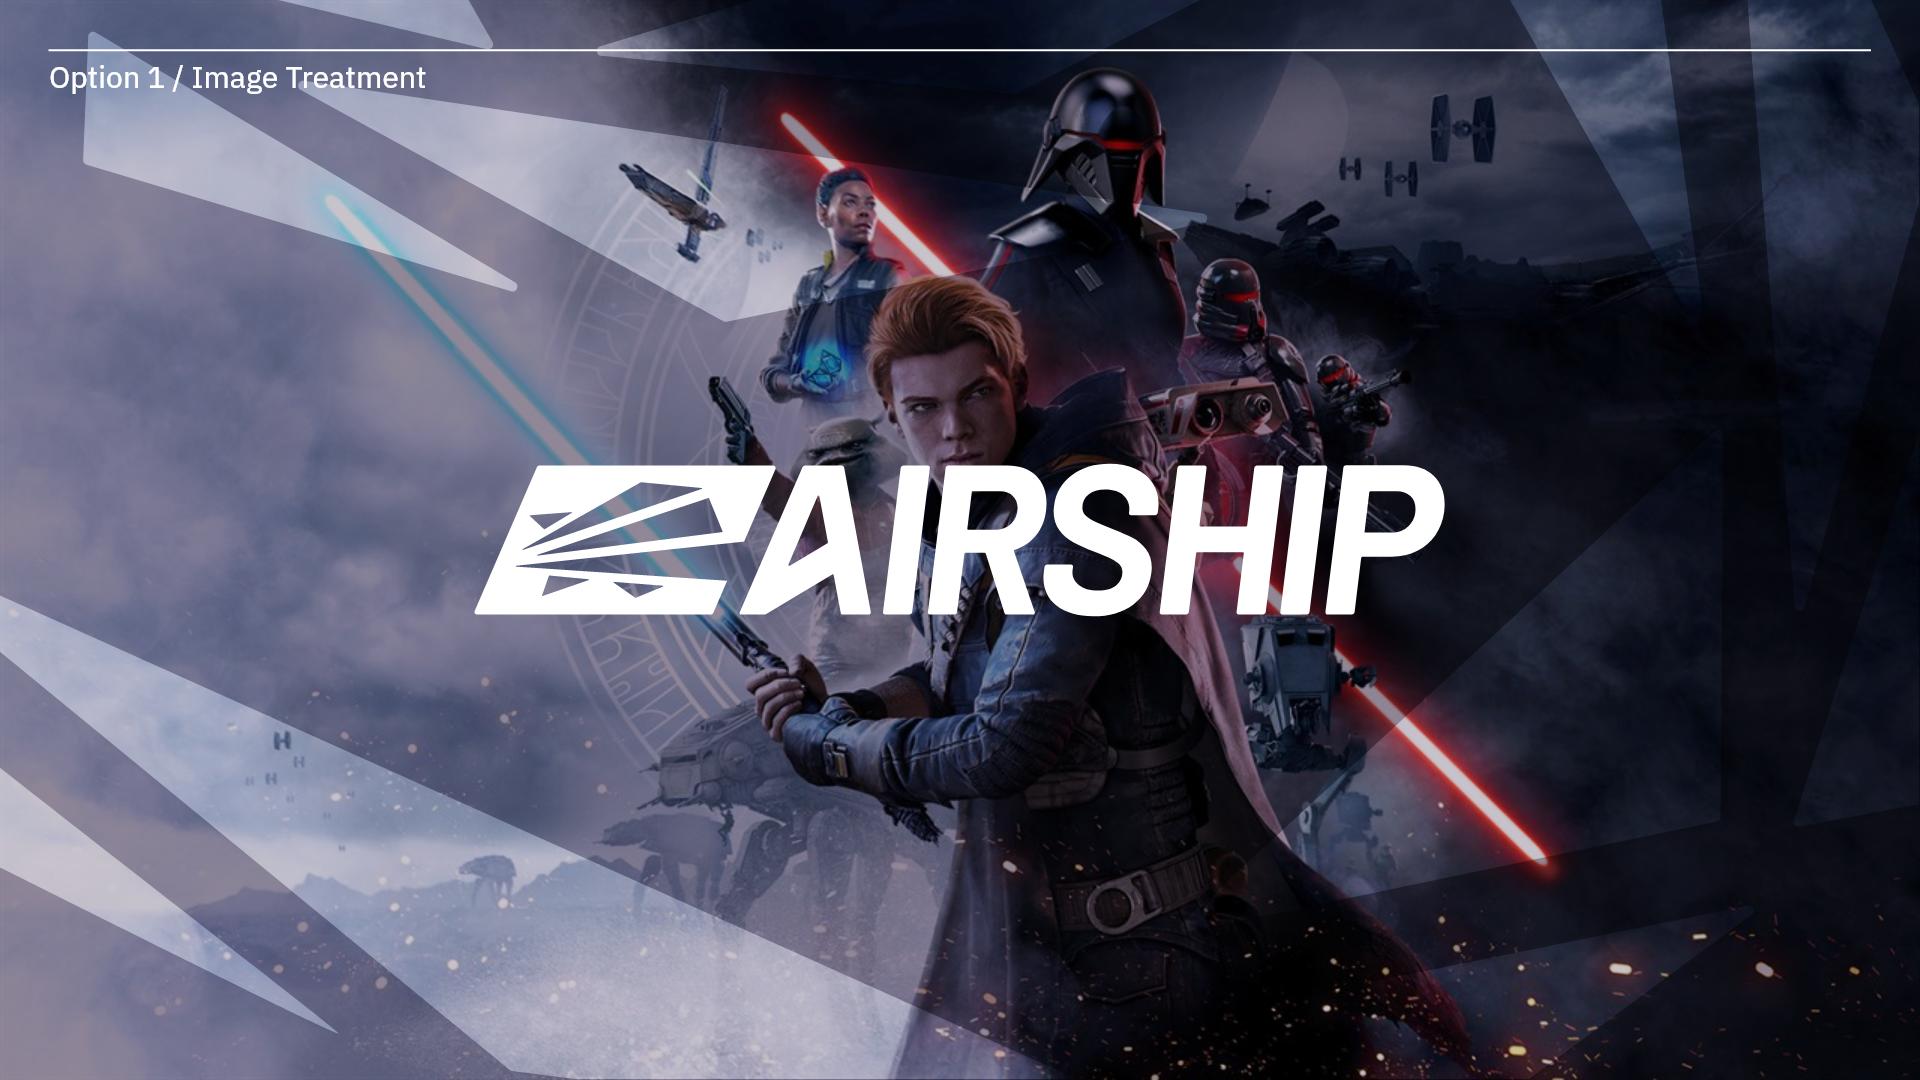 Airship Images | Design & Branding 3